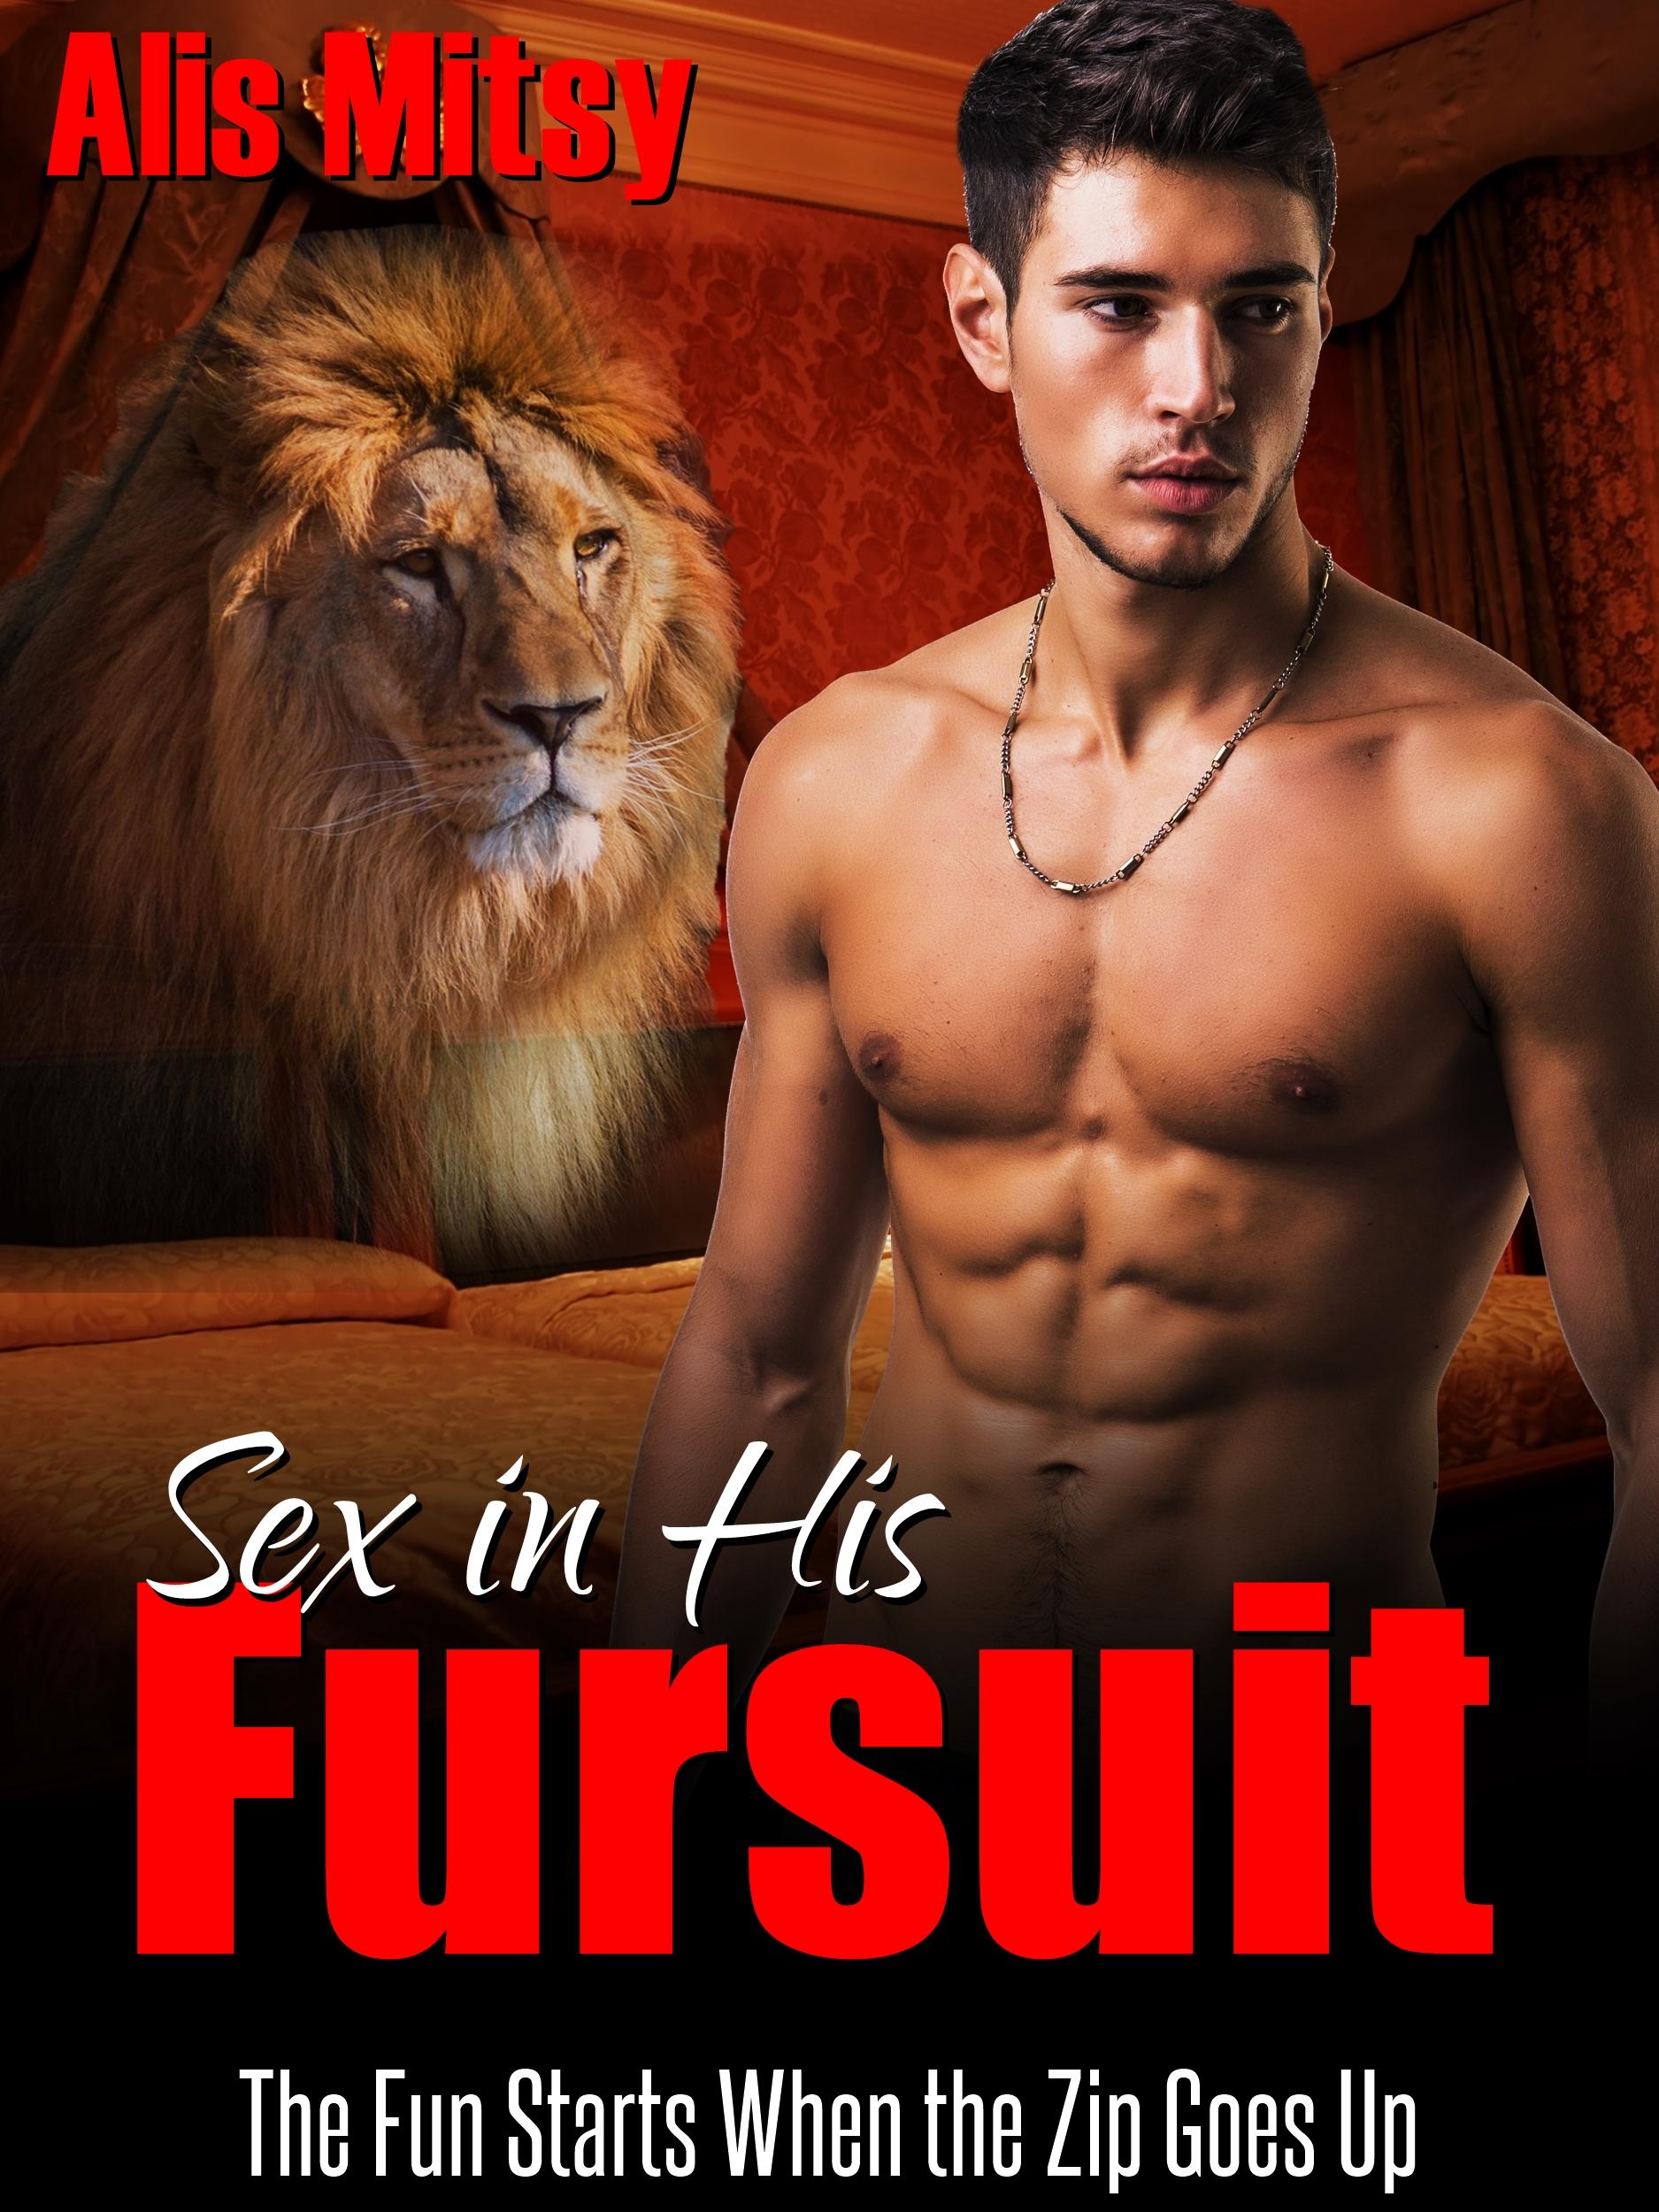 Gay fursuit sex